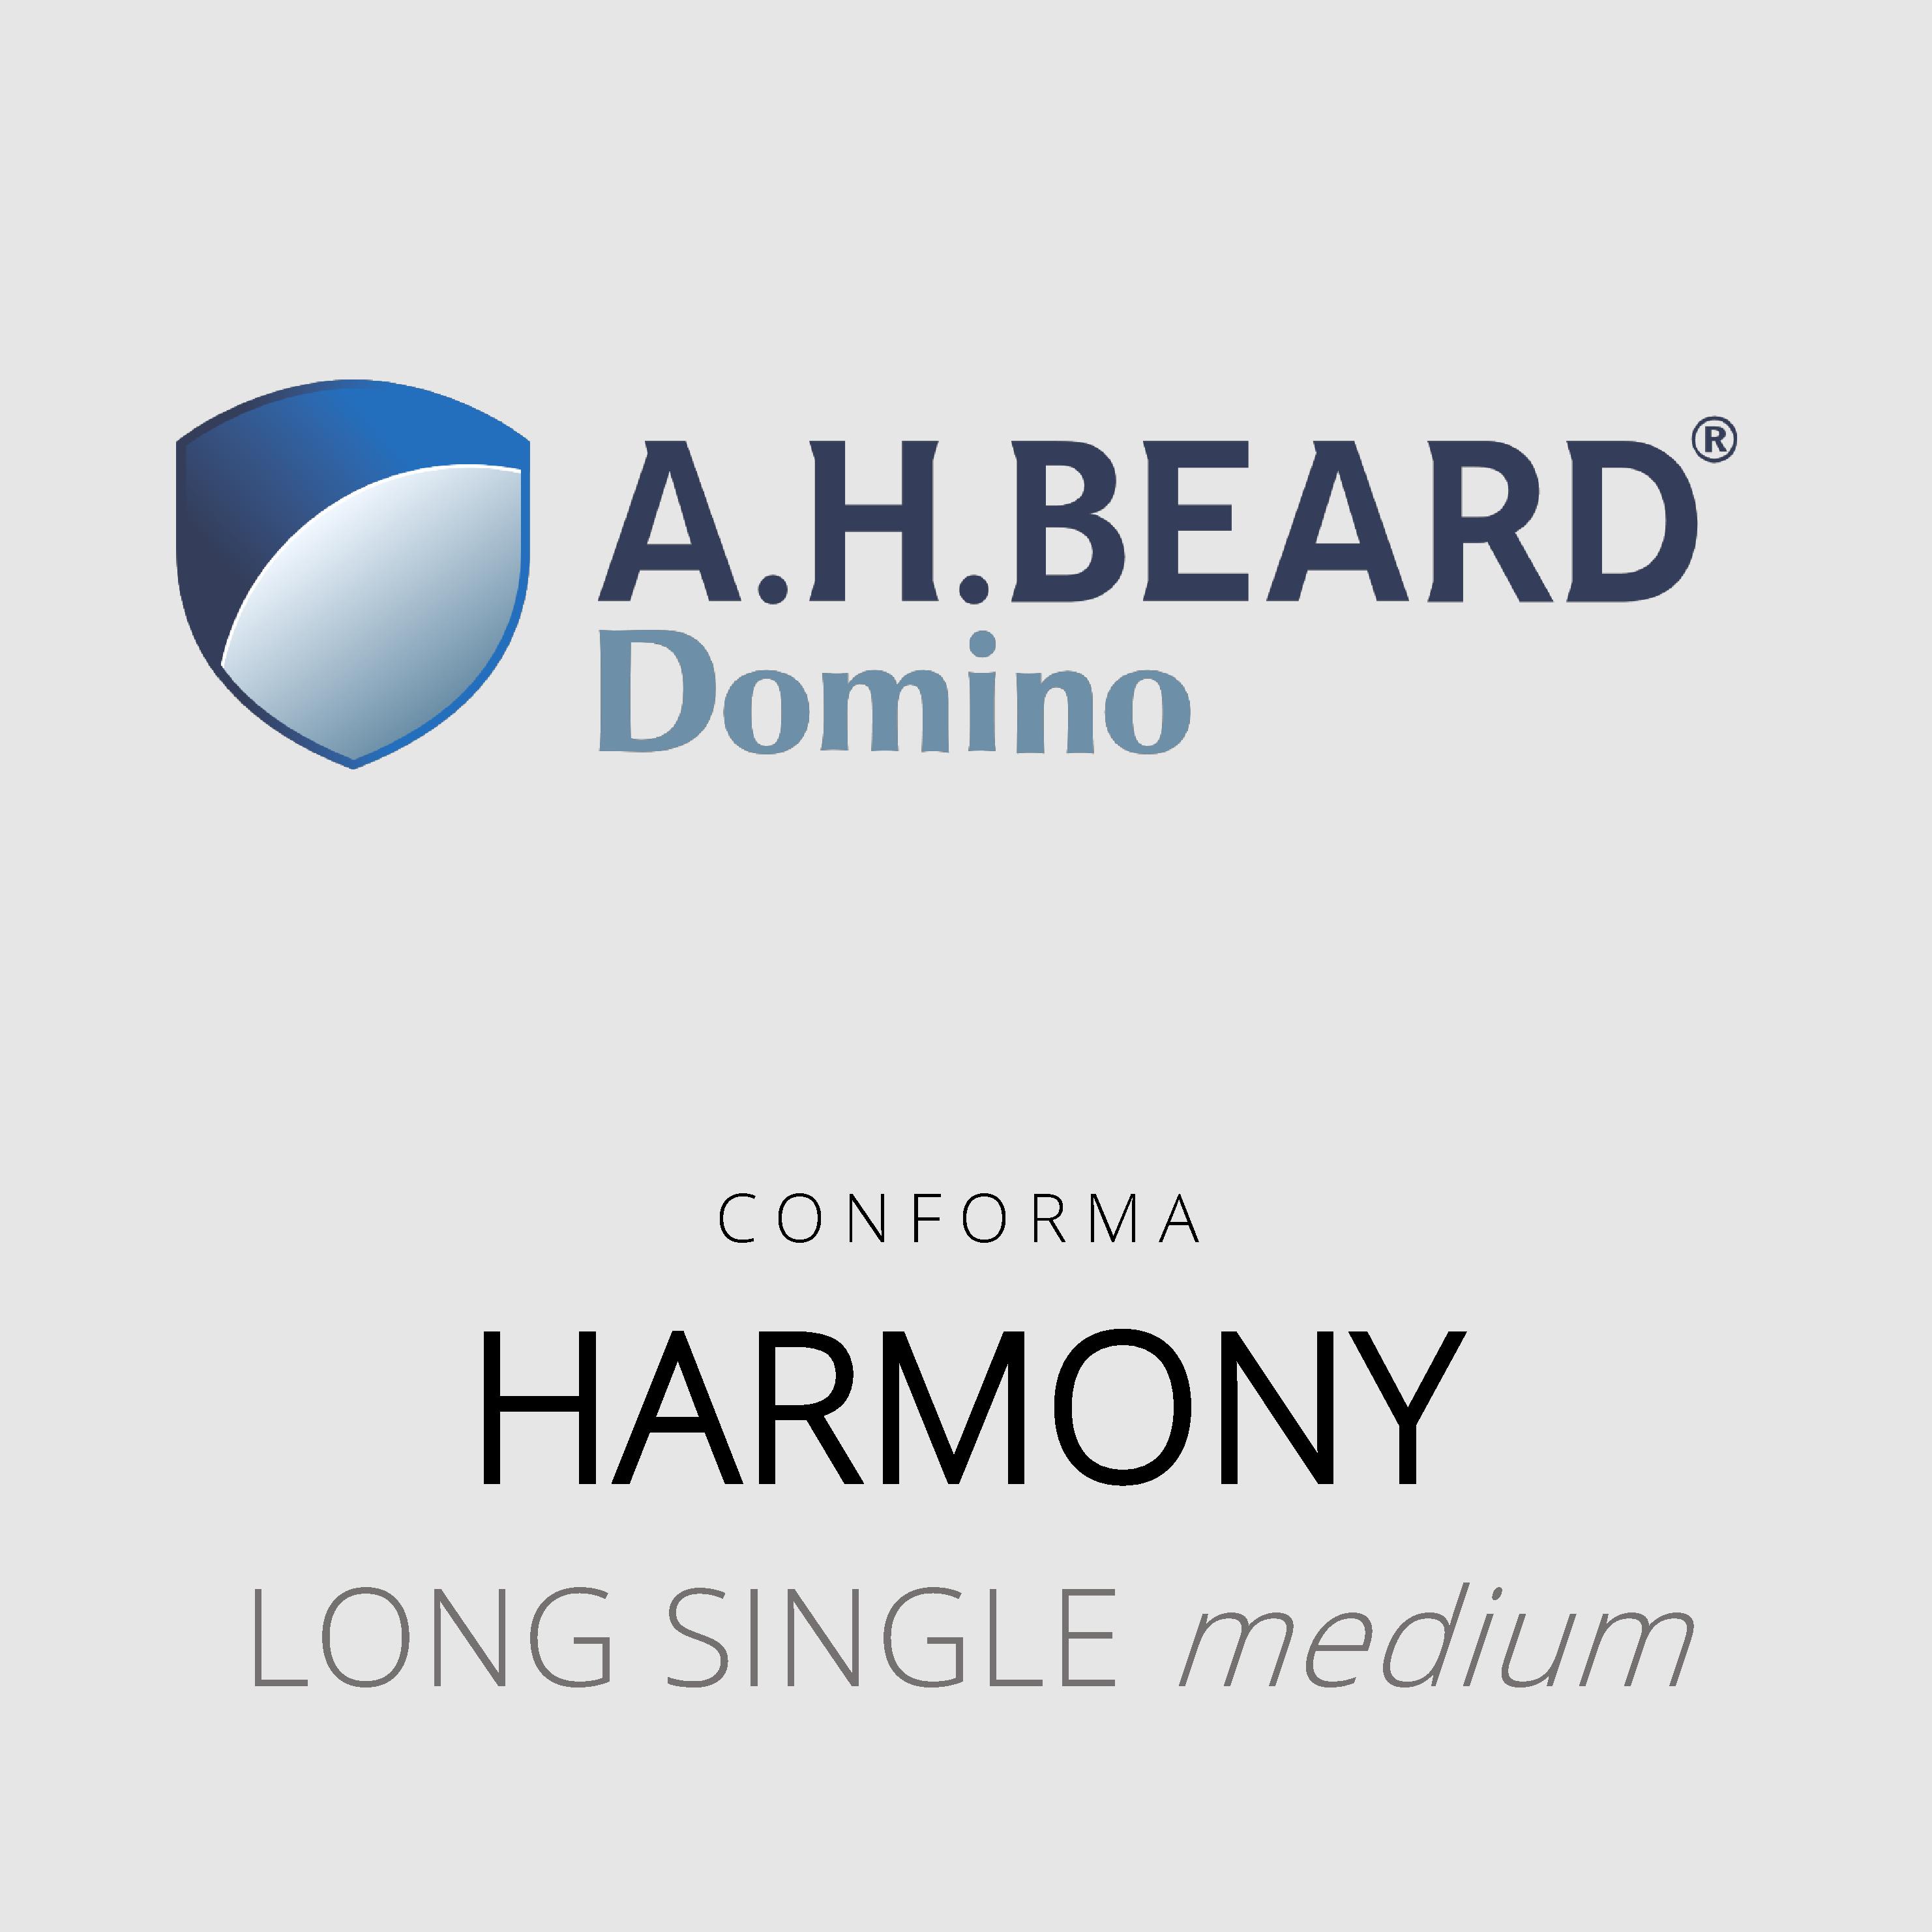 AH Beard Domino – Harmony – Conforma – Long Single Medium Mattress